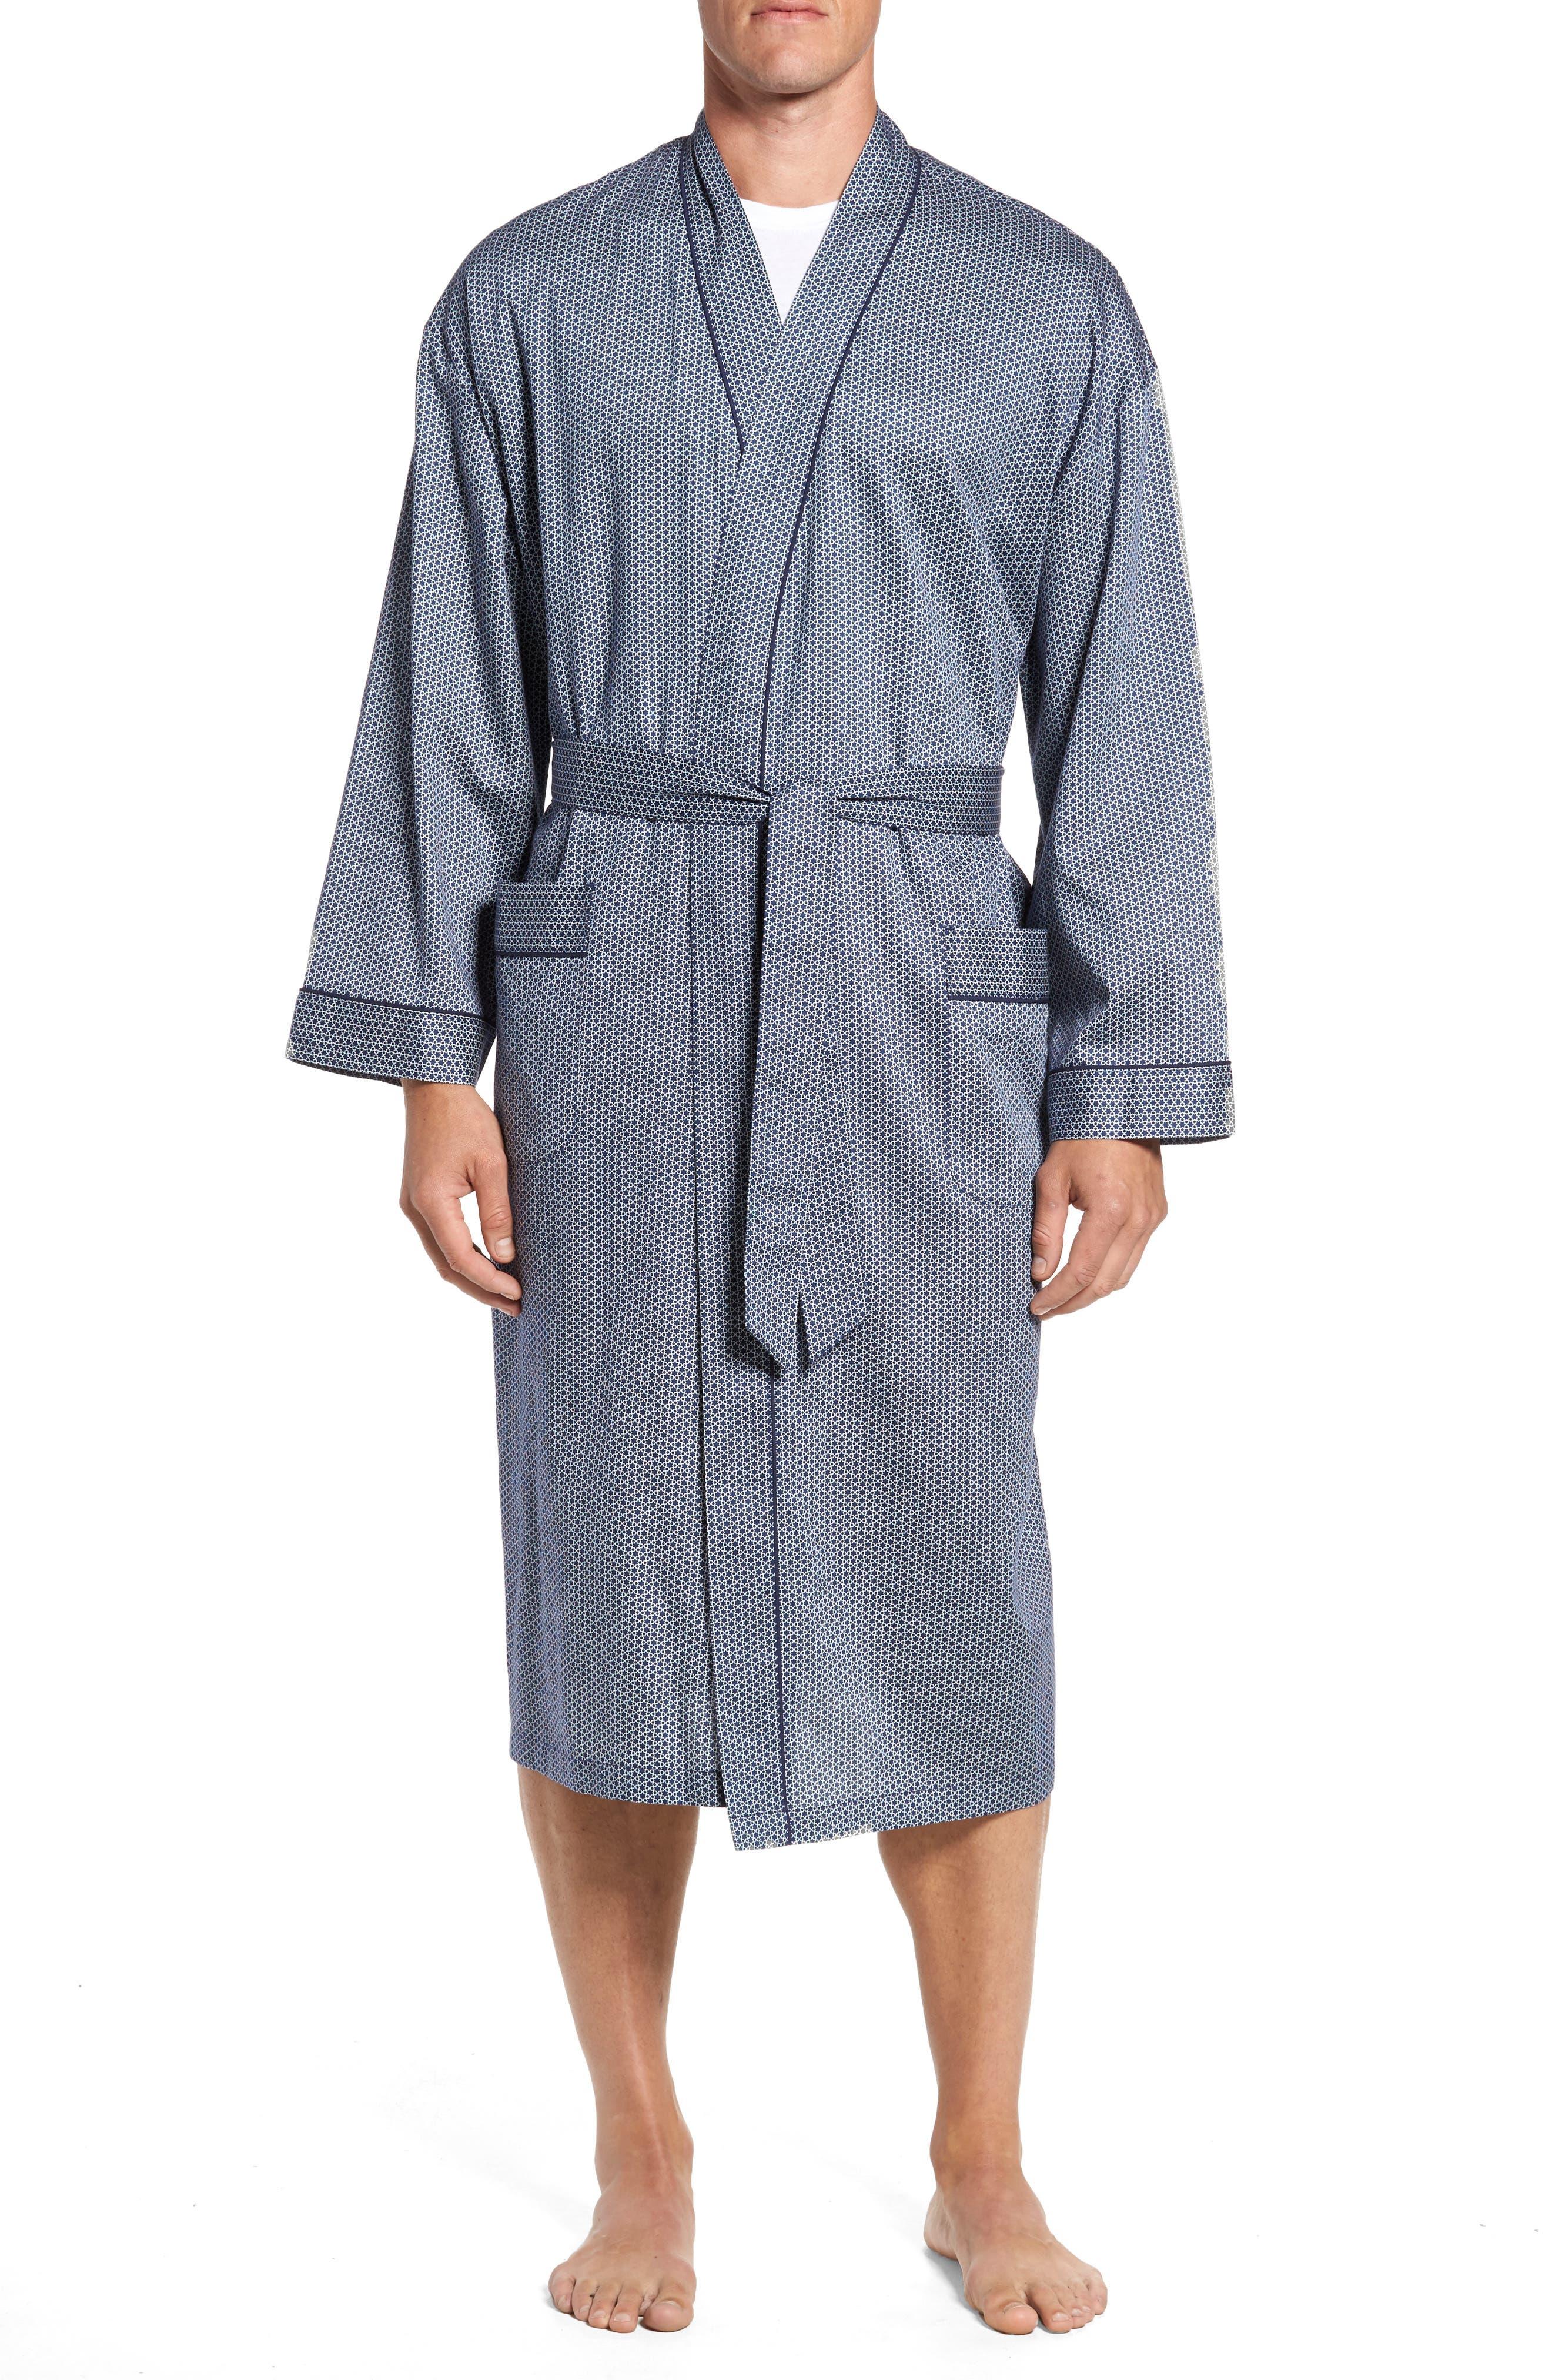 Winterlude Robe,                         Main,                         color, Navy Stars